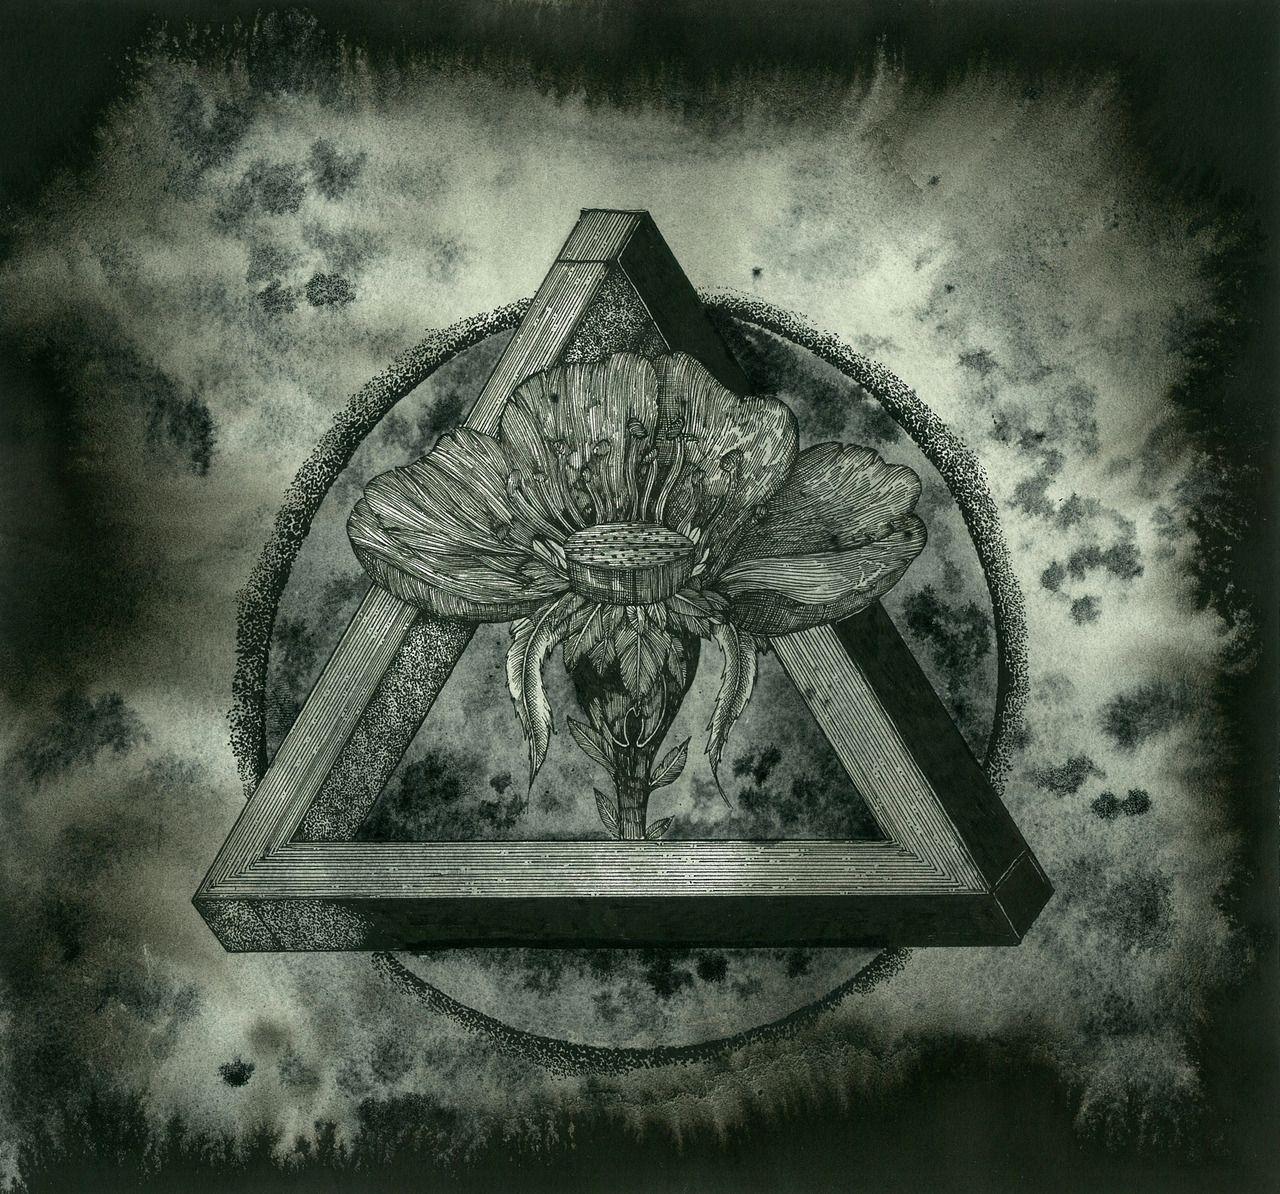 Sin Eater Illustrations: Photo